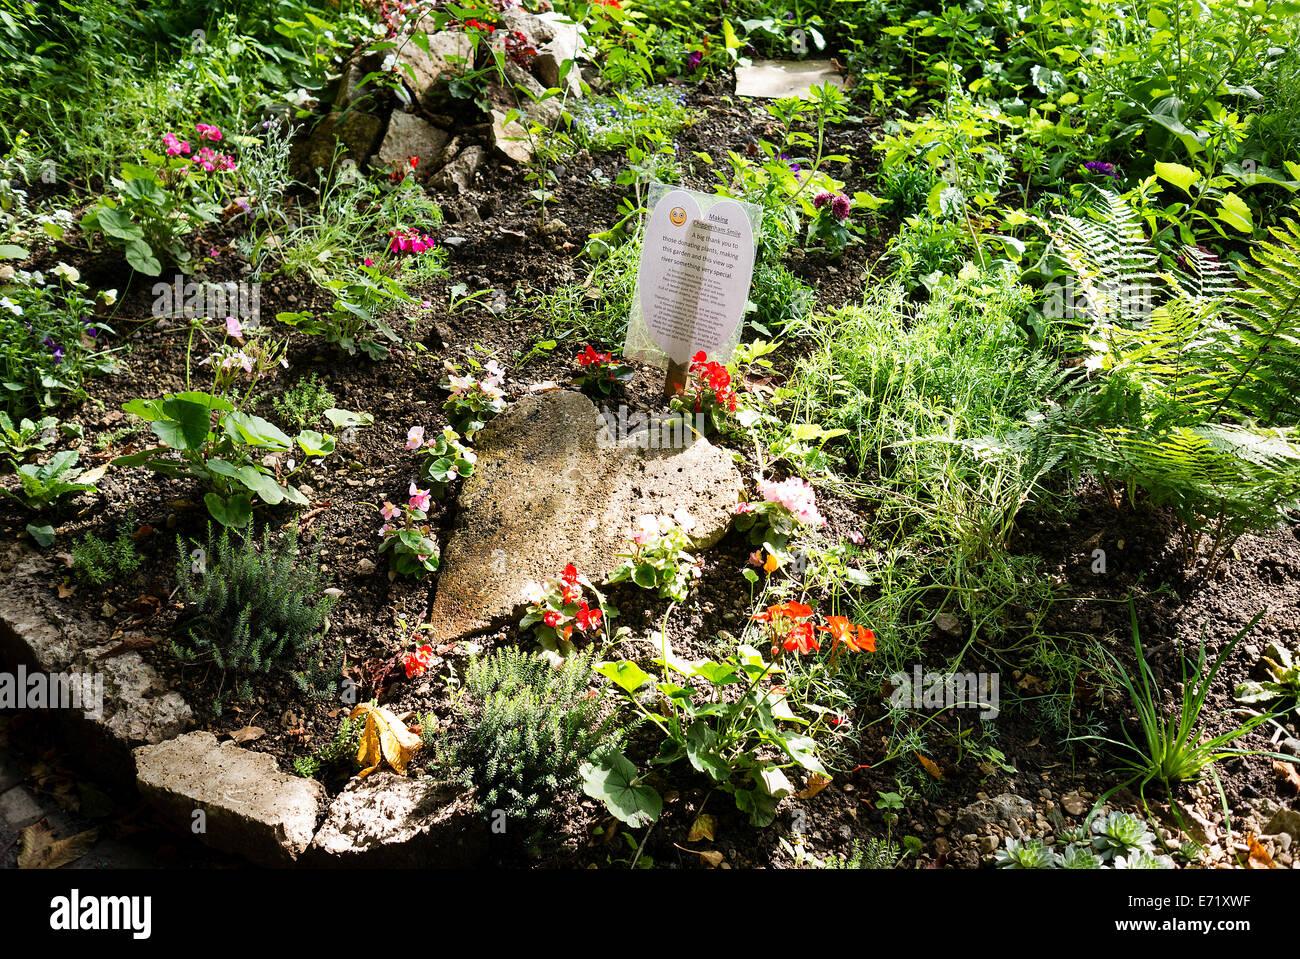 Community garden in Chippenham UKz - Stock Image